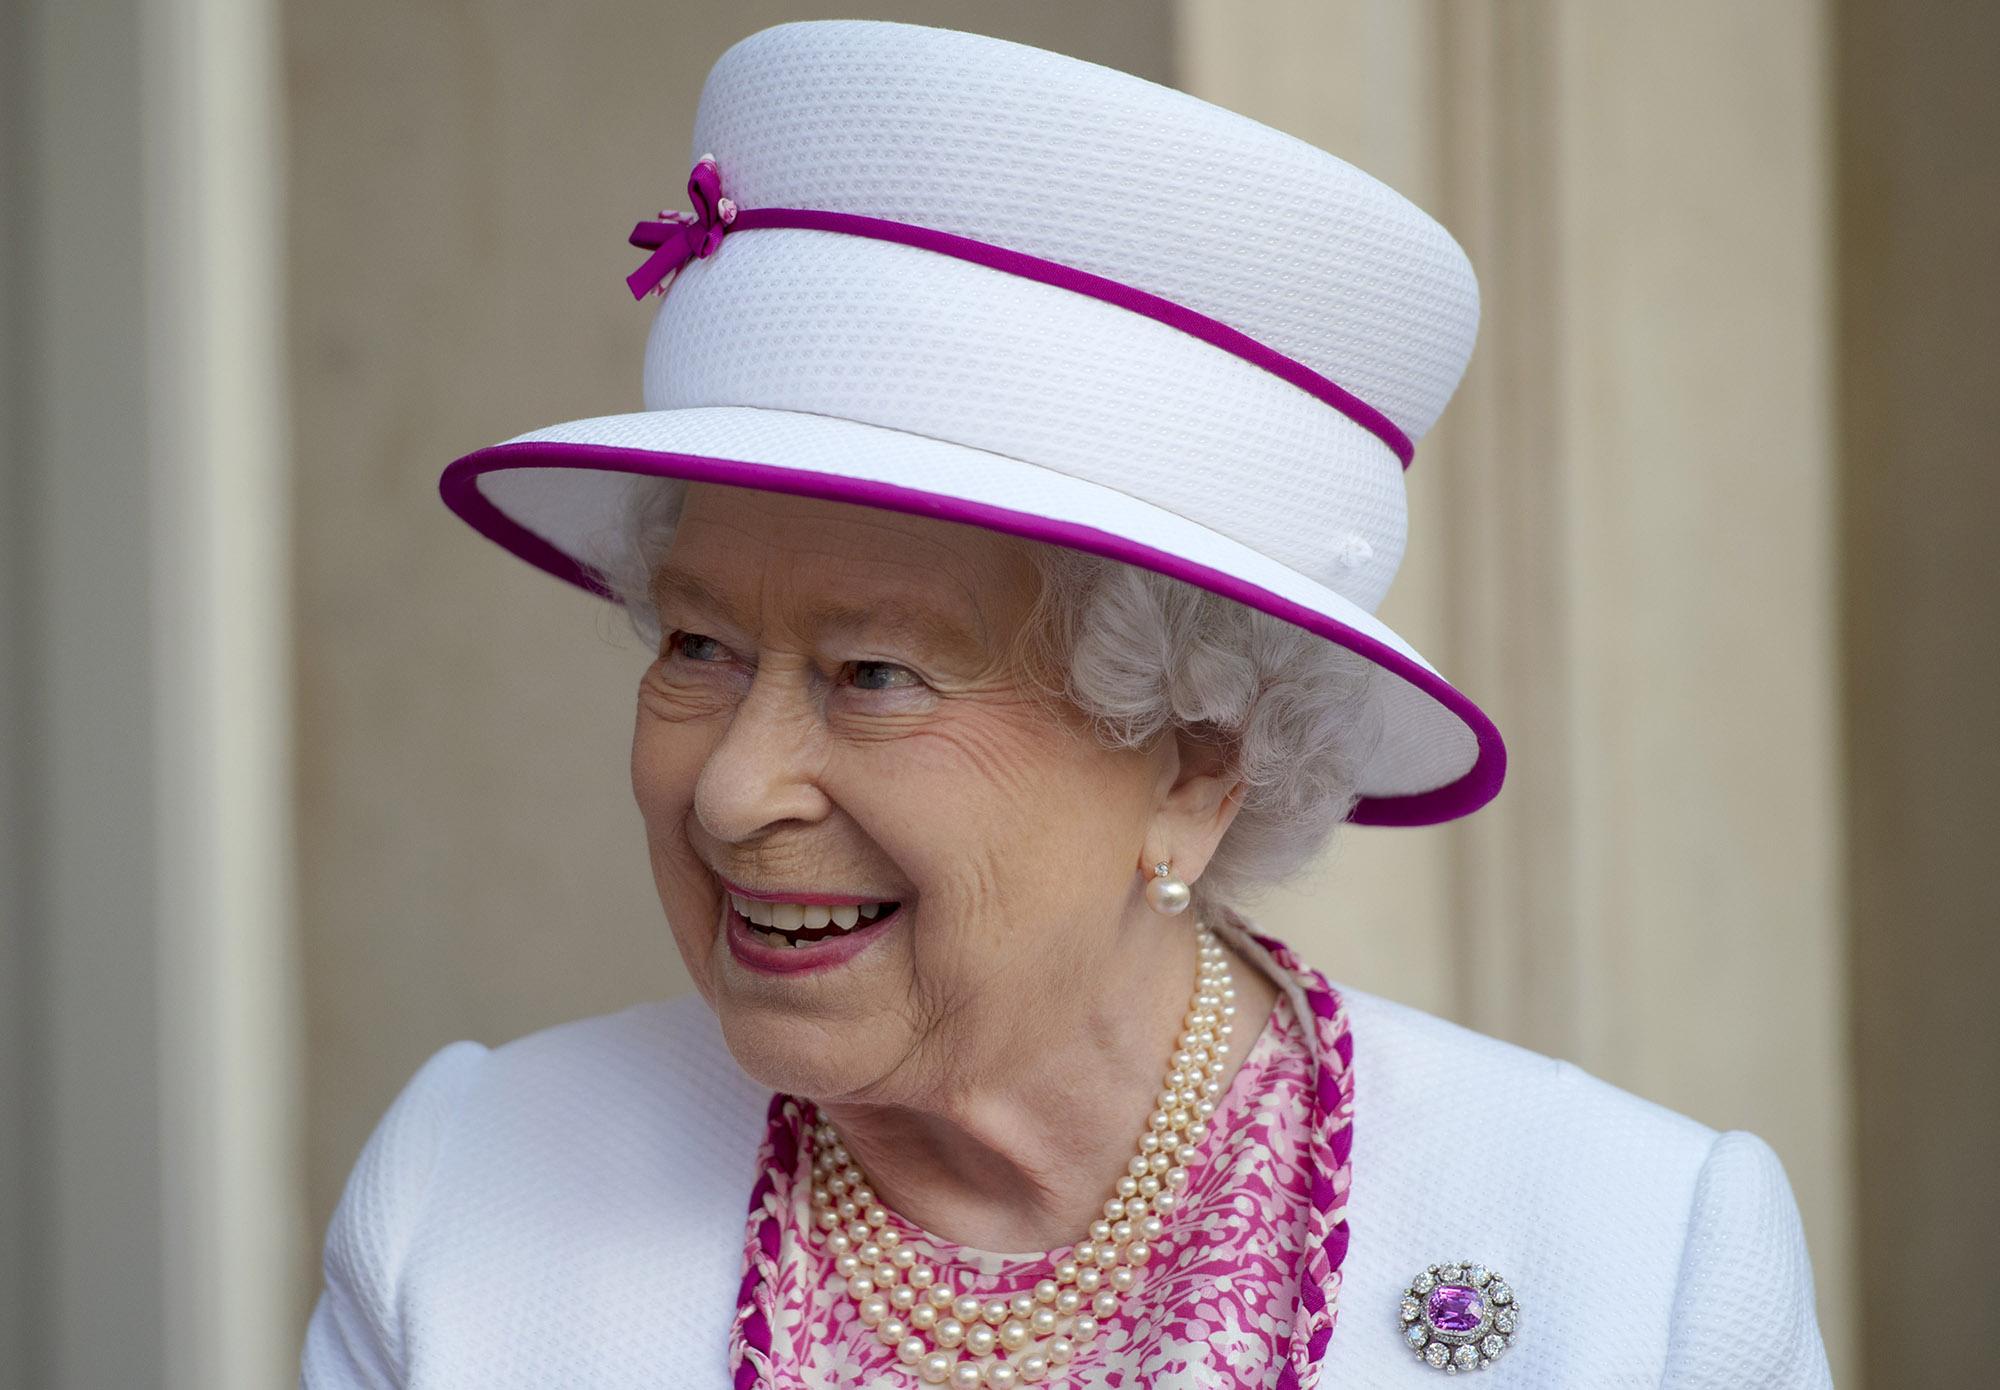 LONDON, ENGLAND - JUNE 9:  Queen Elizabeth II visits Marlborough House (Photo by Hannah McKay - WPA Pool/Getty Images)